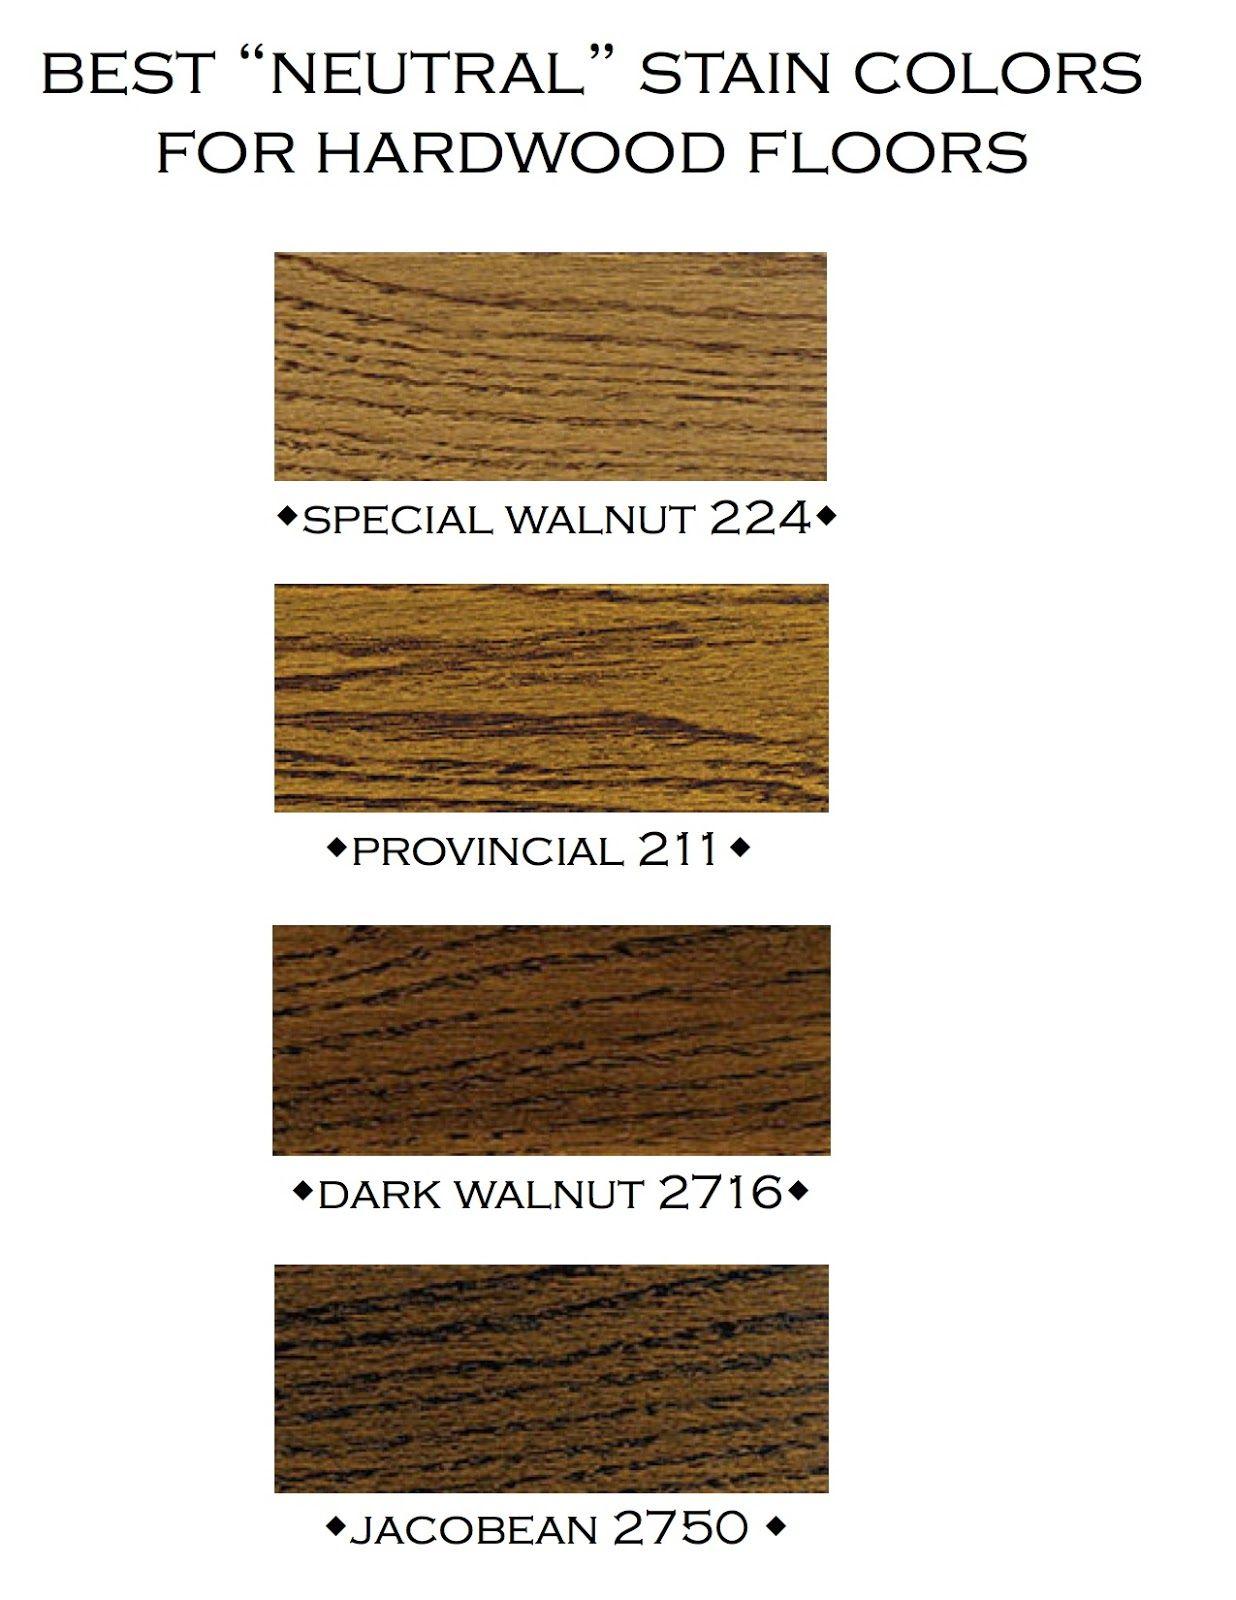 Design Dump Hardwood Stain Options Votes Floor Stain Colors Wood Floor Stain Colors Wood Stain Colors